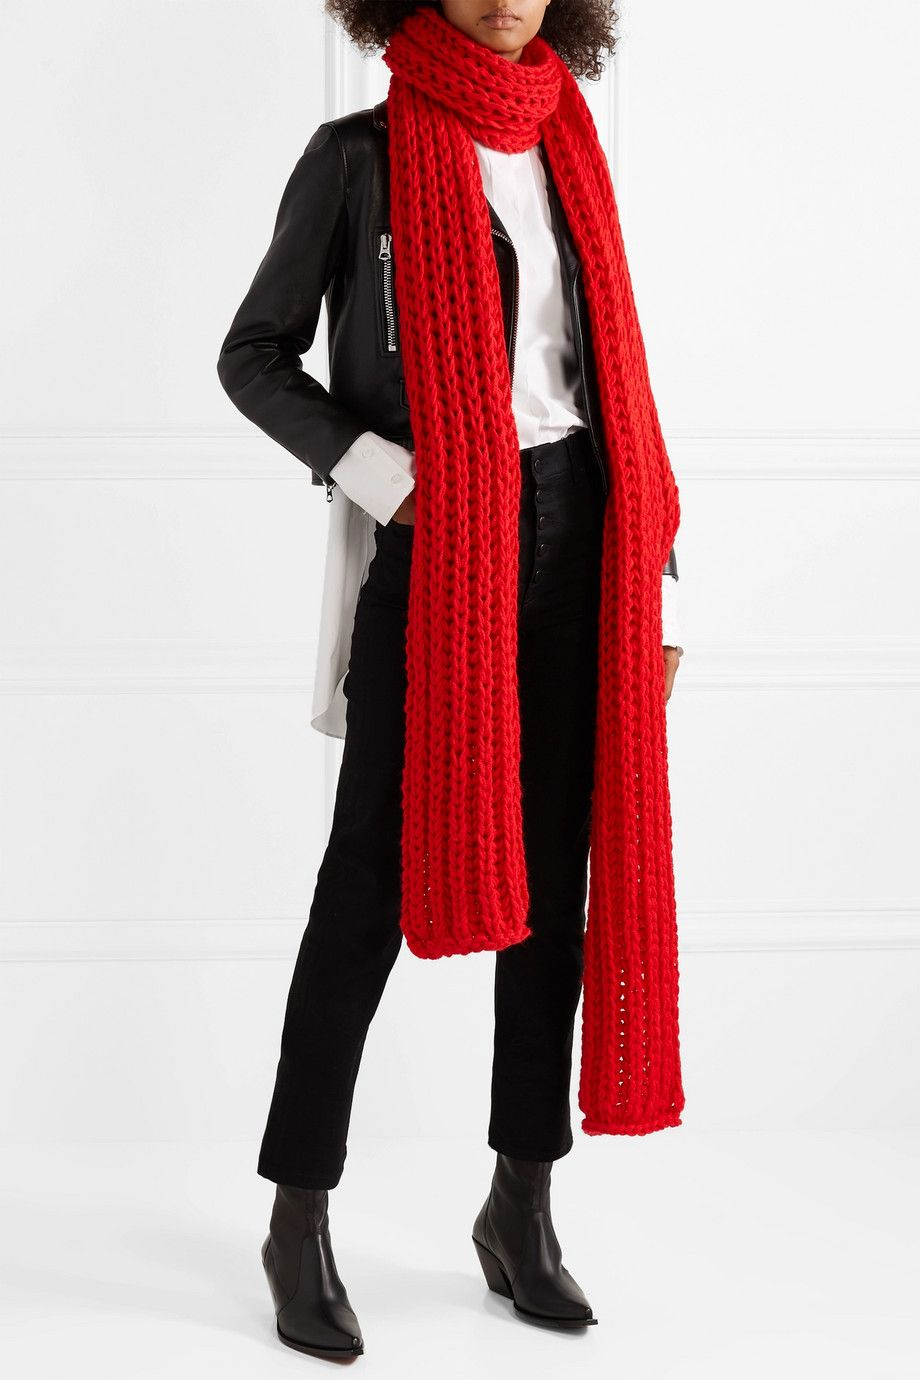 A.W.A.K.E. Wool scarf